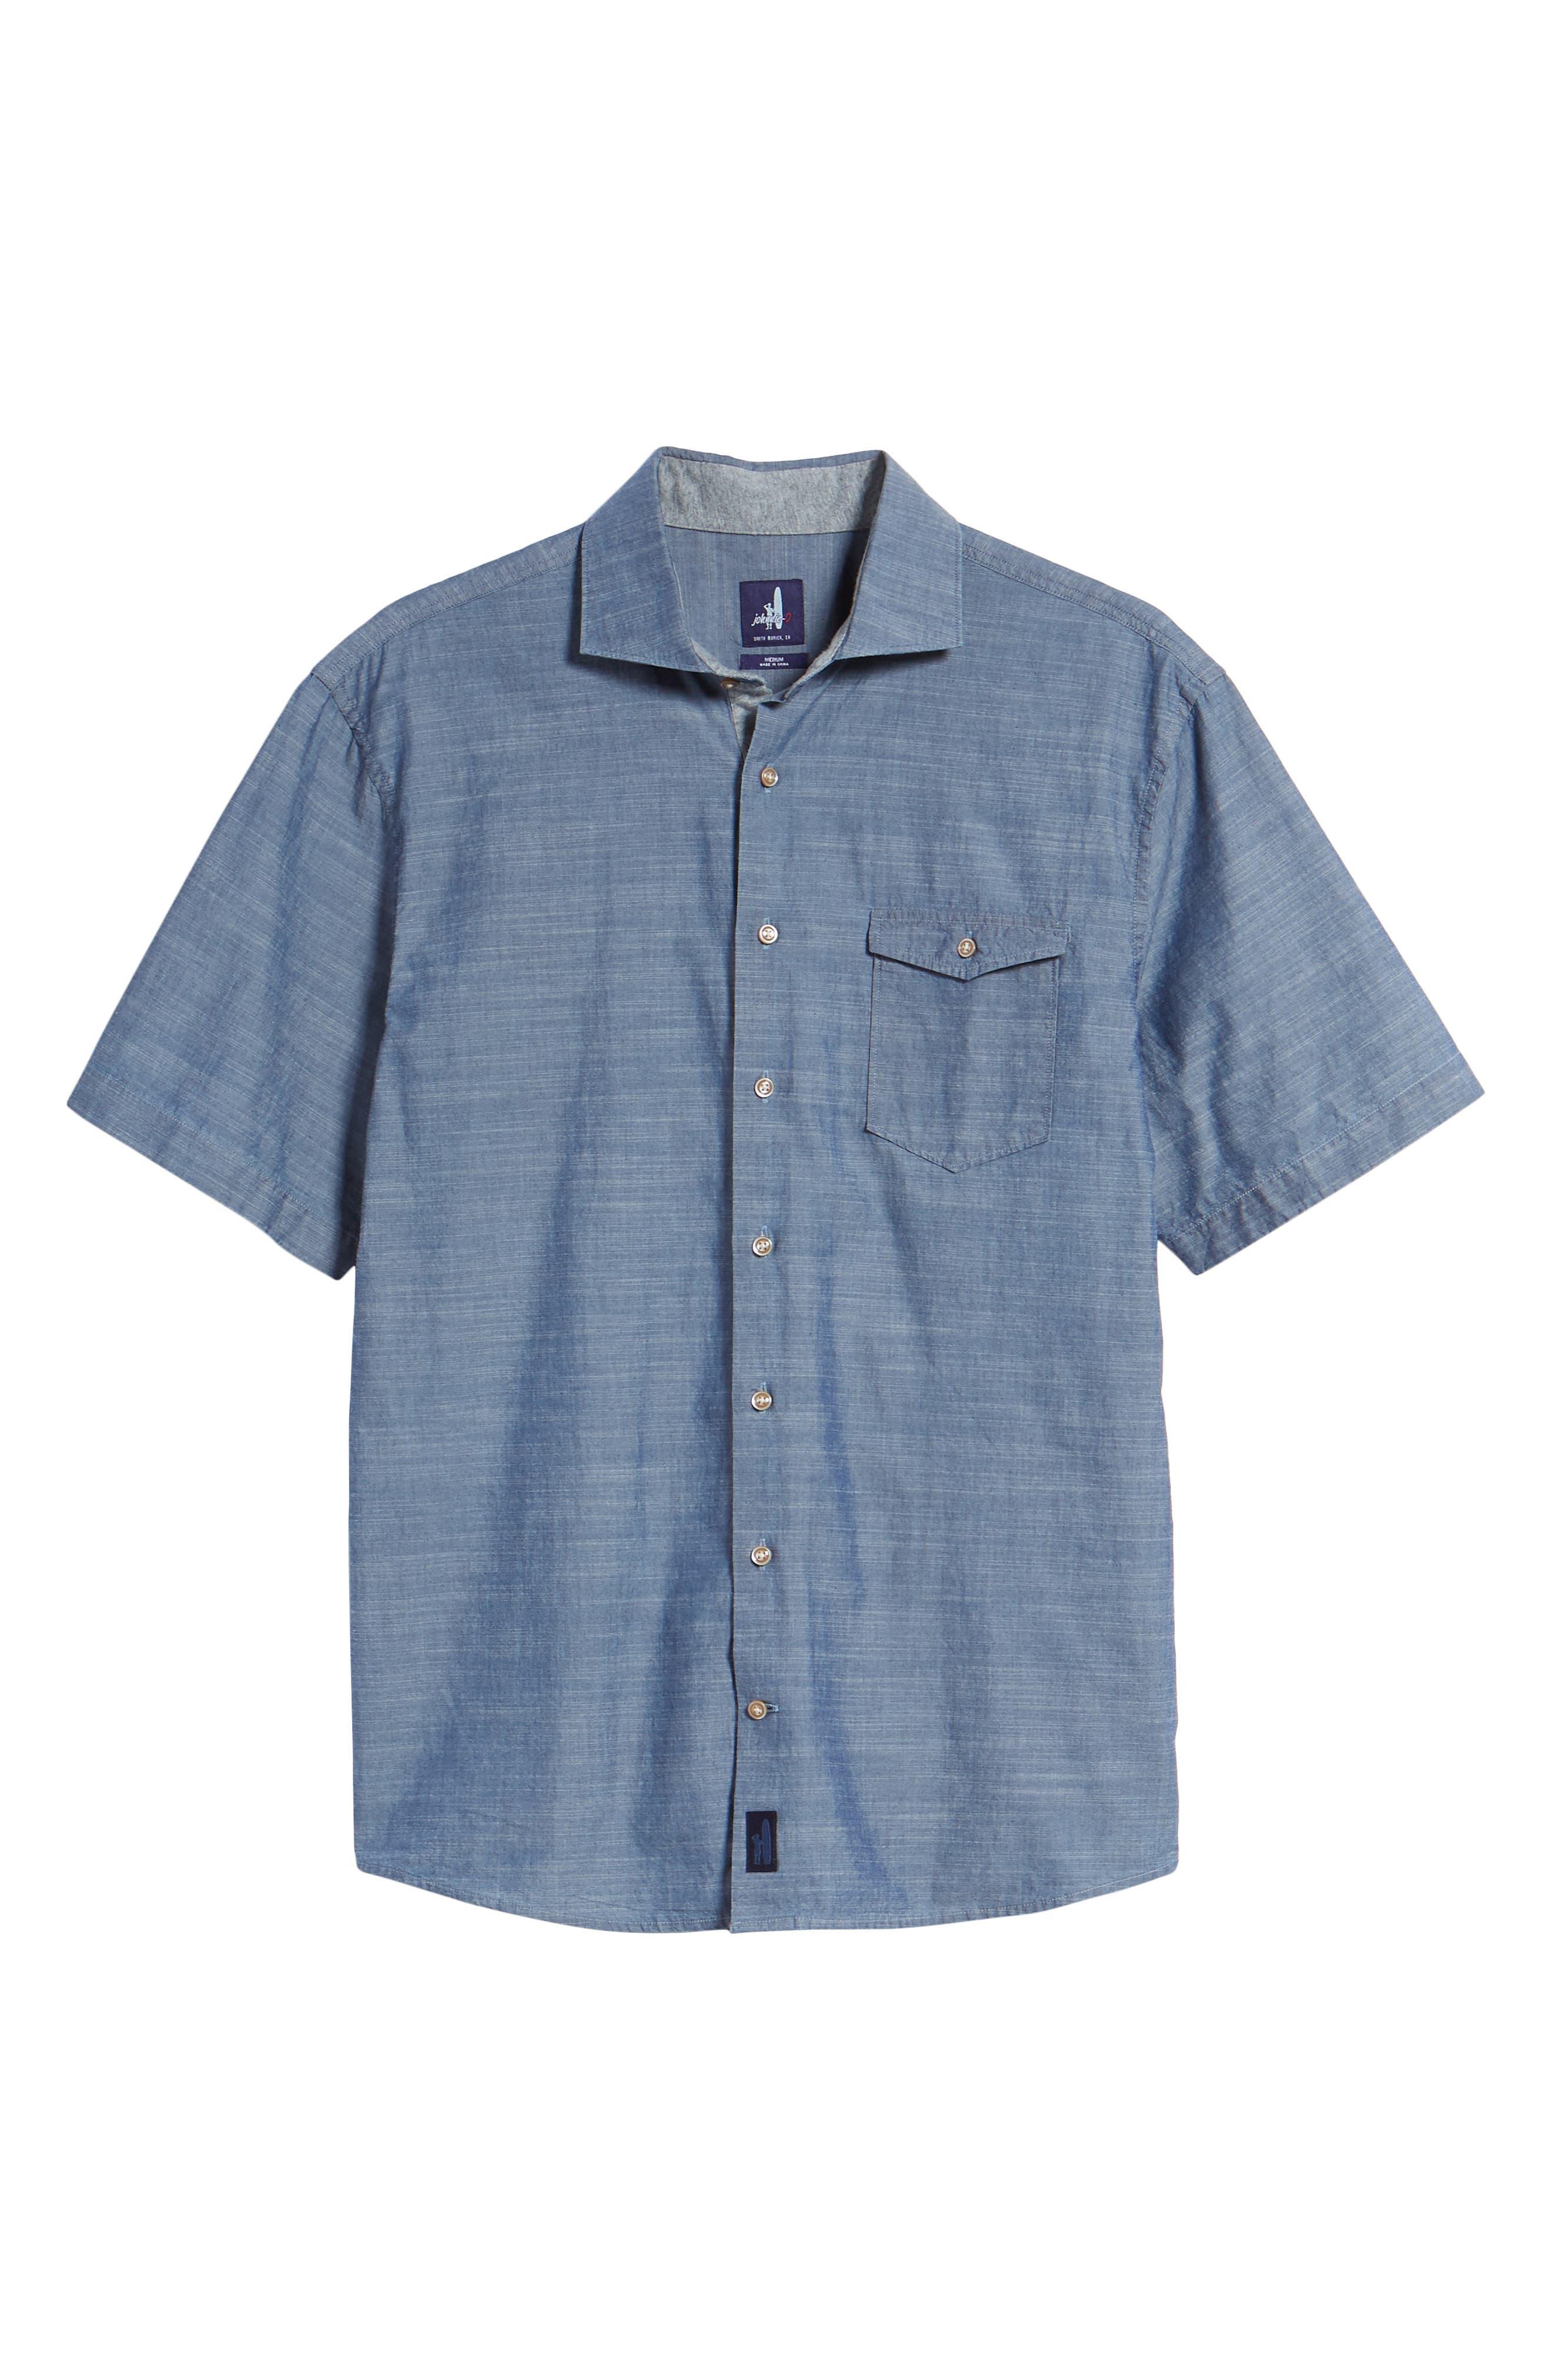 Lucas Regular Fit Chambray Sport Shirt,                             Alternate thumbnail 6, color,                             Indigo